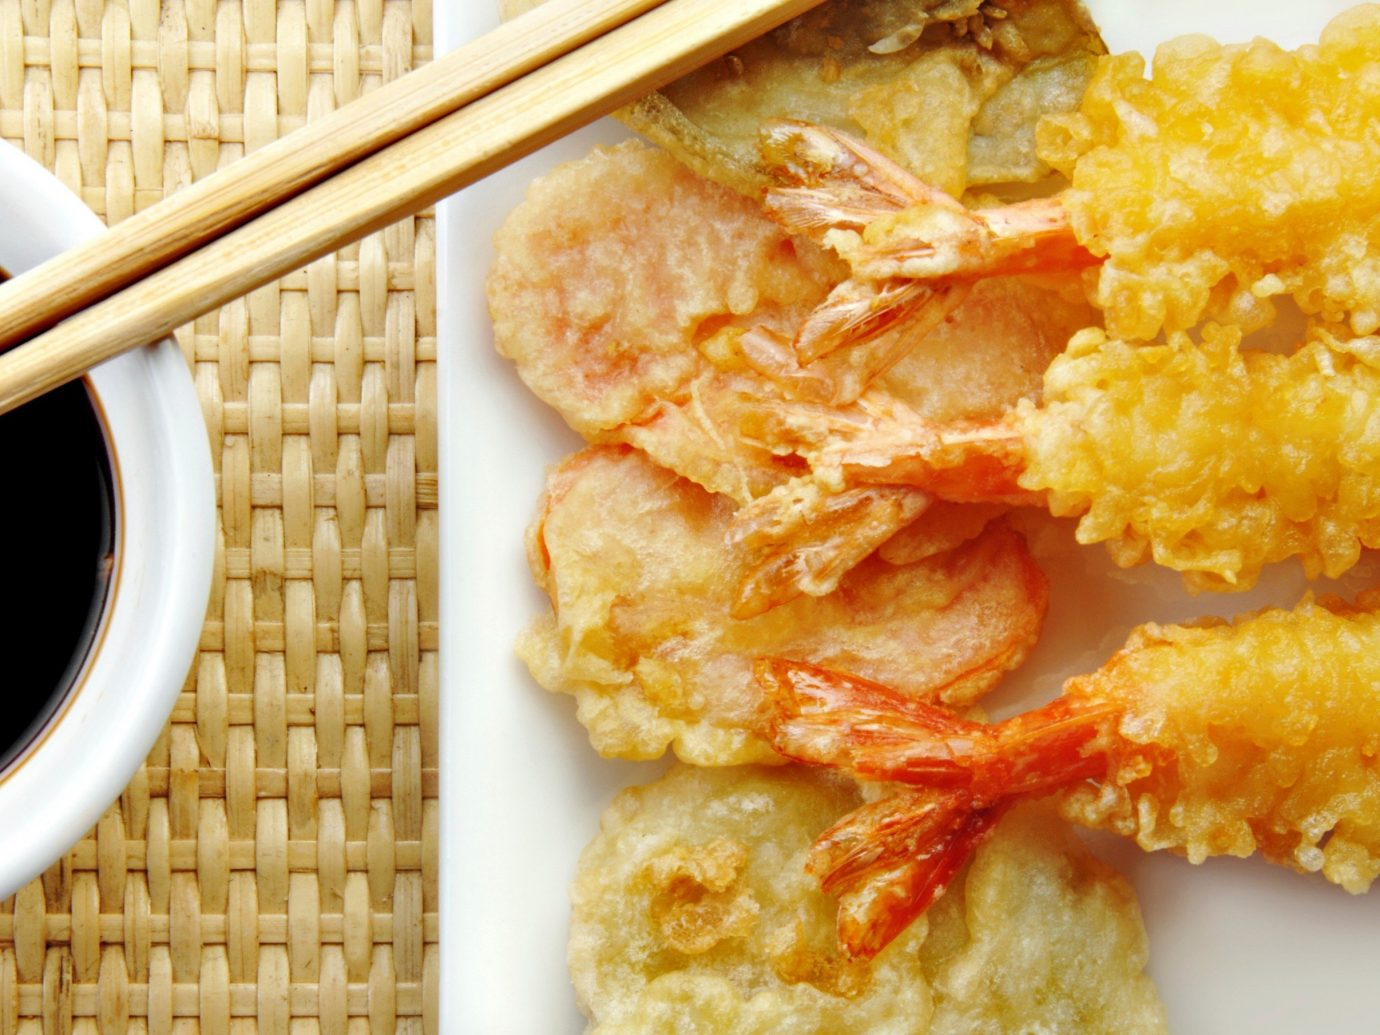 Food + Drink food dish plate cuisine tempura fried food asian food meal fish fried prawn Seafood panko chicken fingers chinese food breakfast